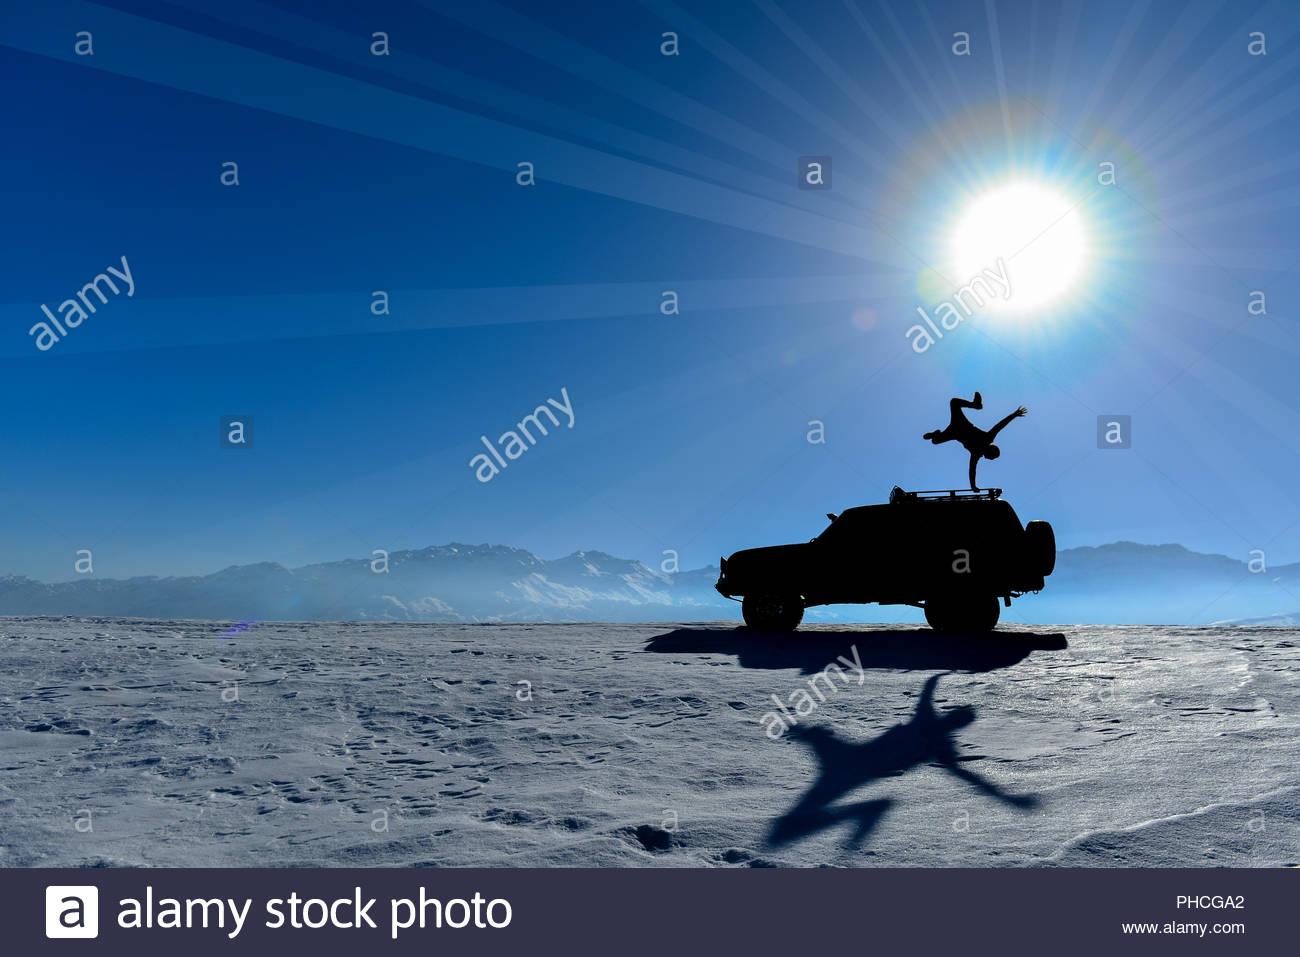 power, balance and motivation - Stock Image